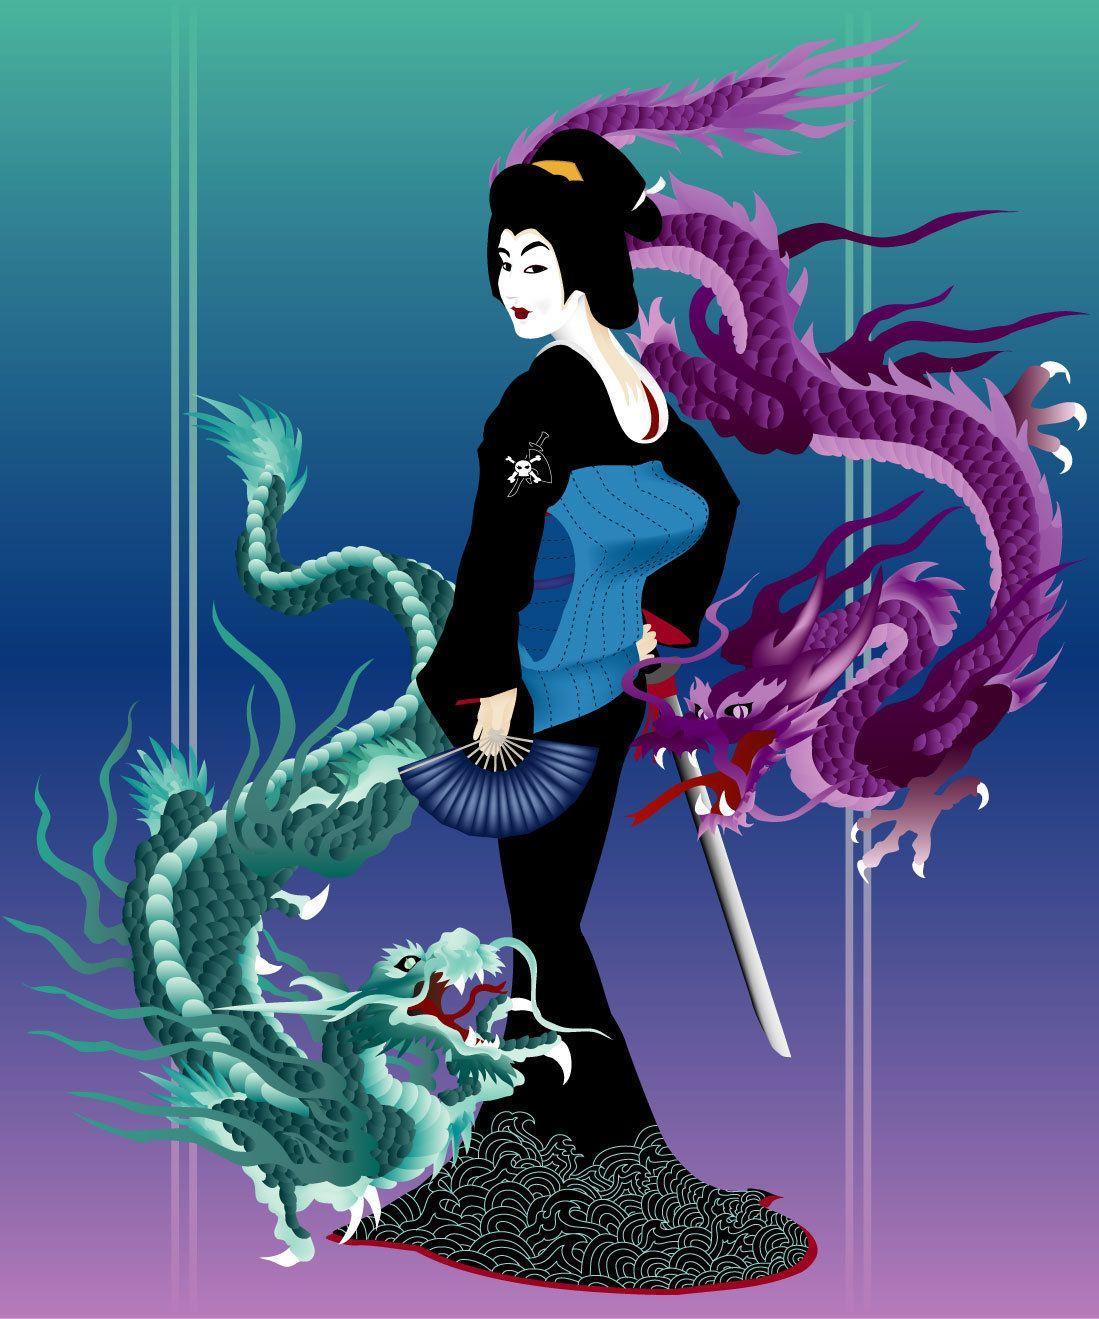 Deviantart Wallpaper: Top Free Yakuza Art Backgrounds